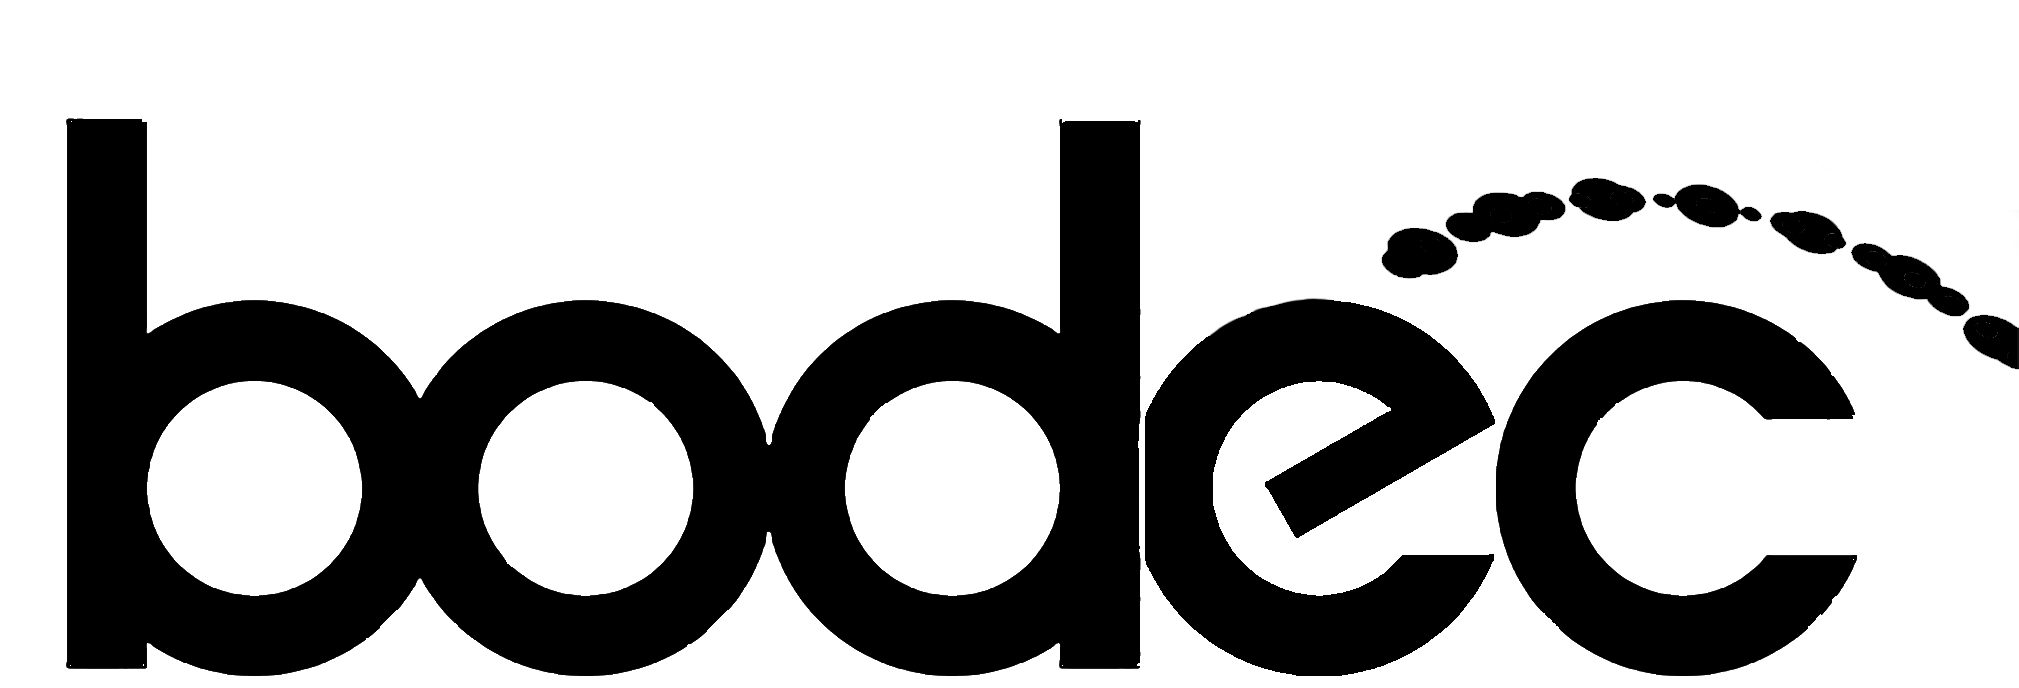 Bodec black & white logo